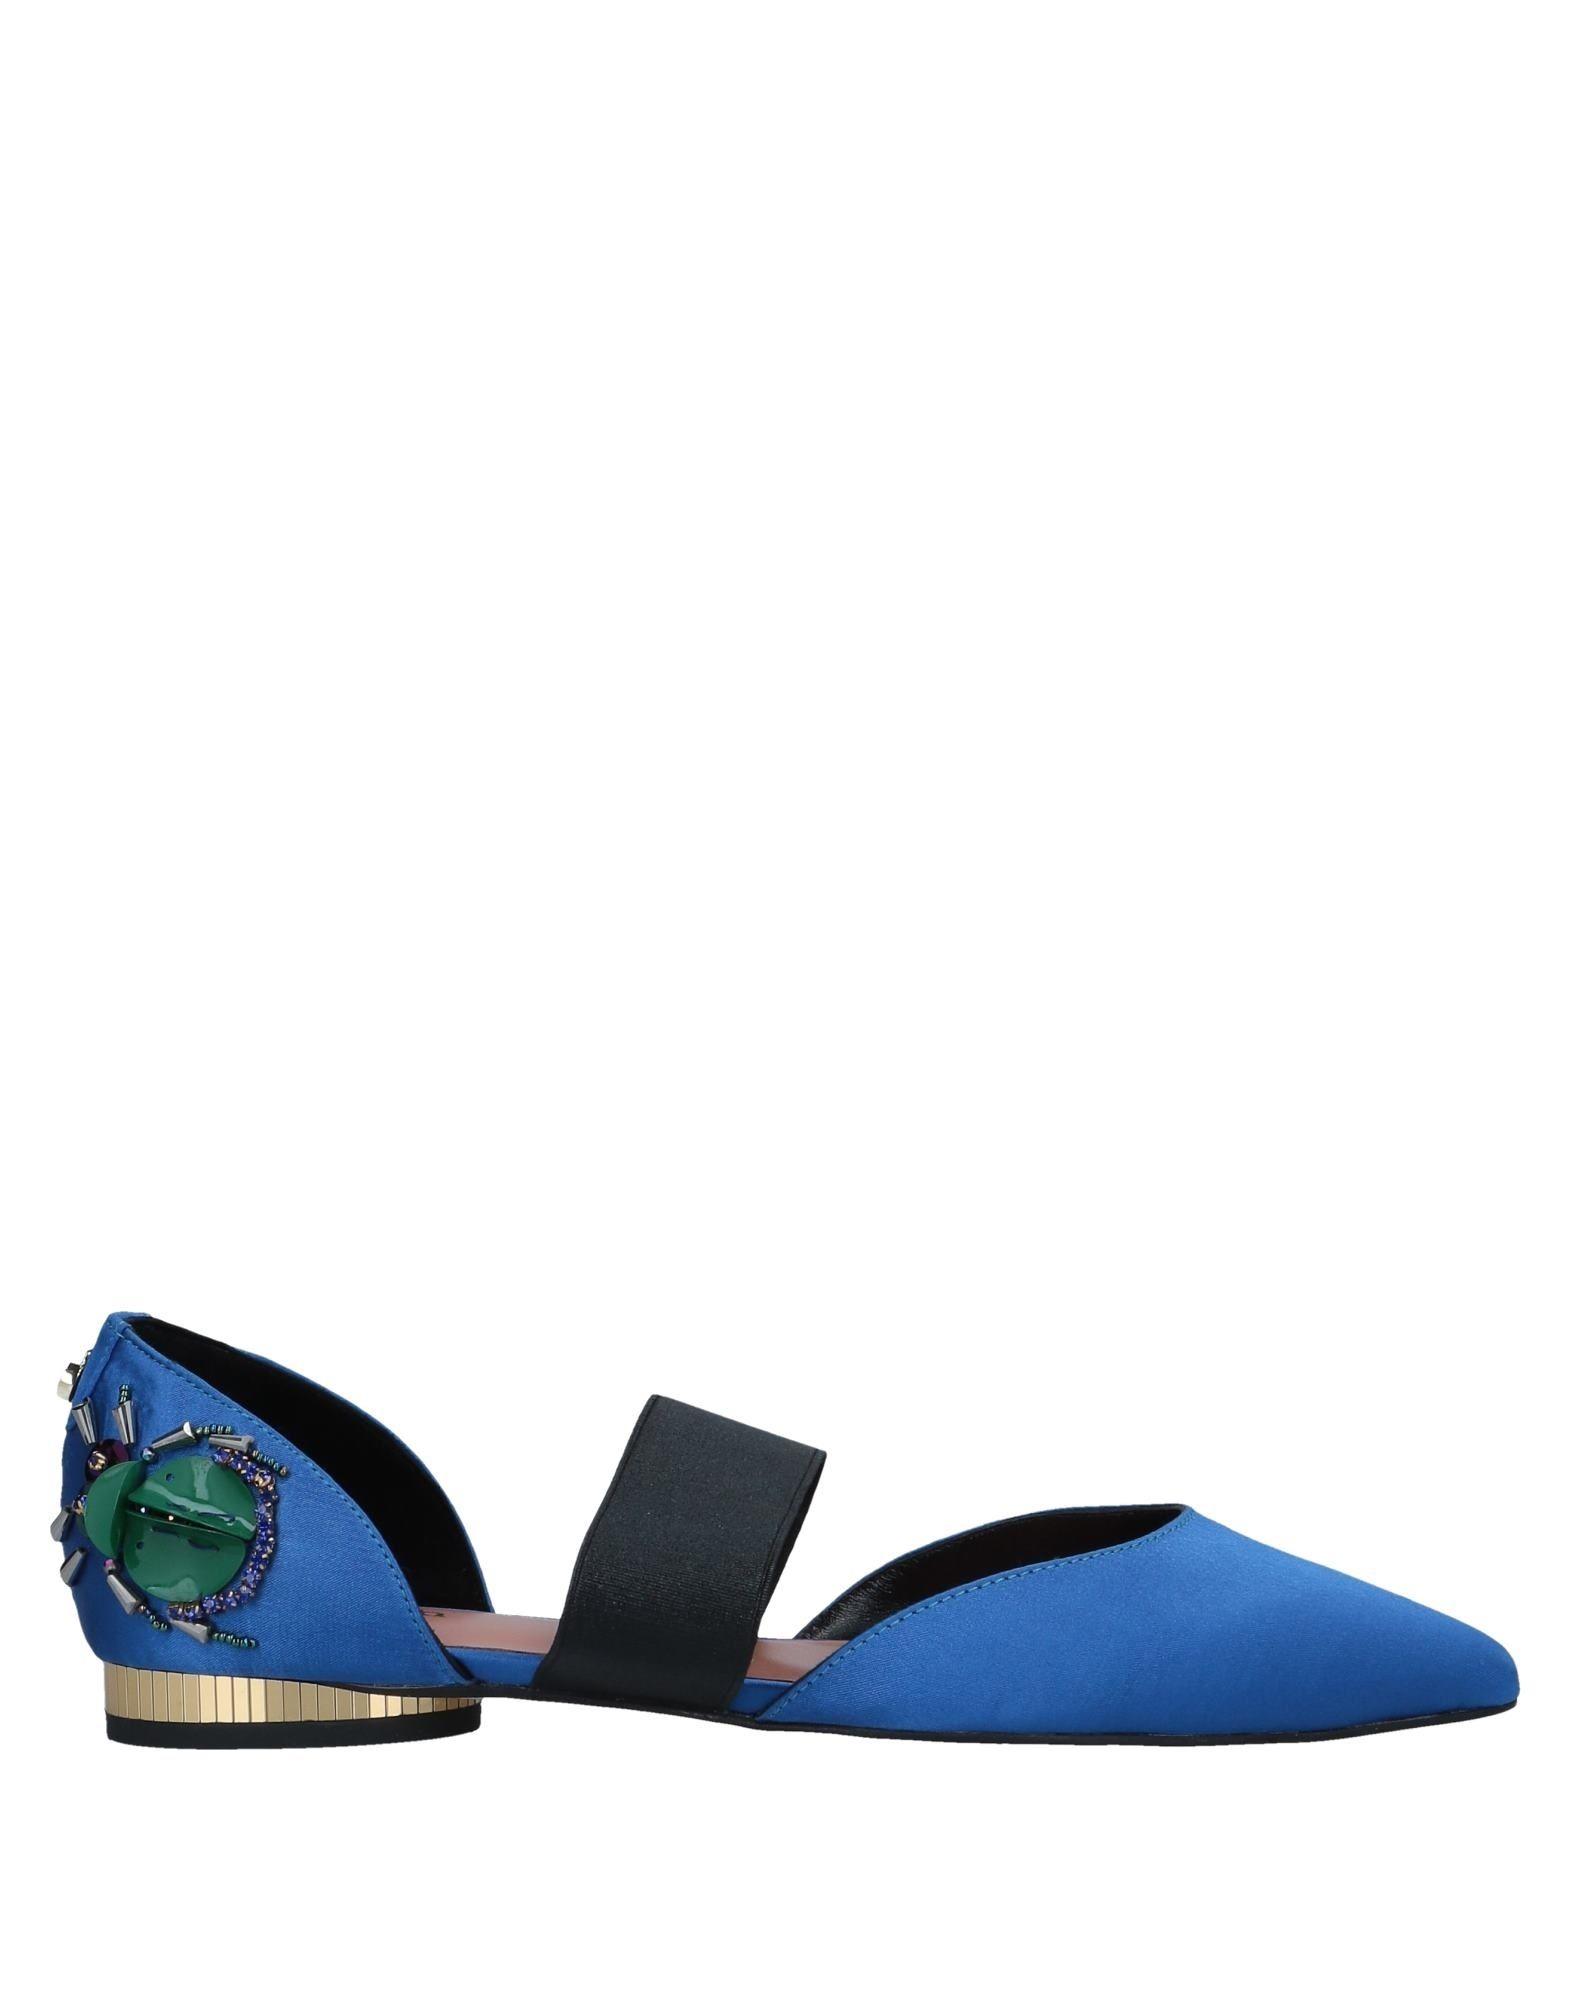 Max & Co. Ballet Flats Co. - Women Max & Co. Flats Ballet Flats online on  United Kingdom - 11532906EF 5028b7